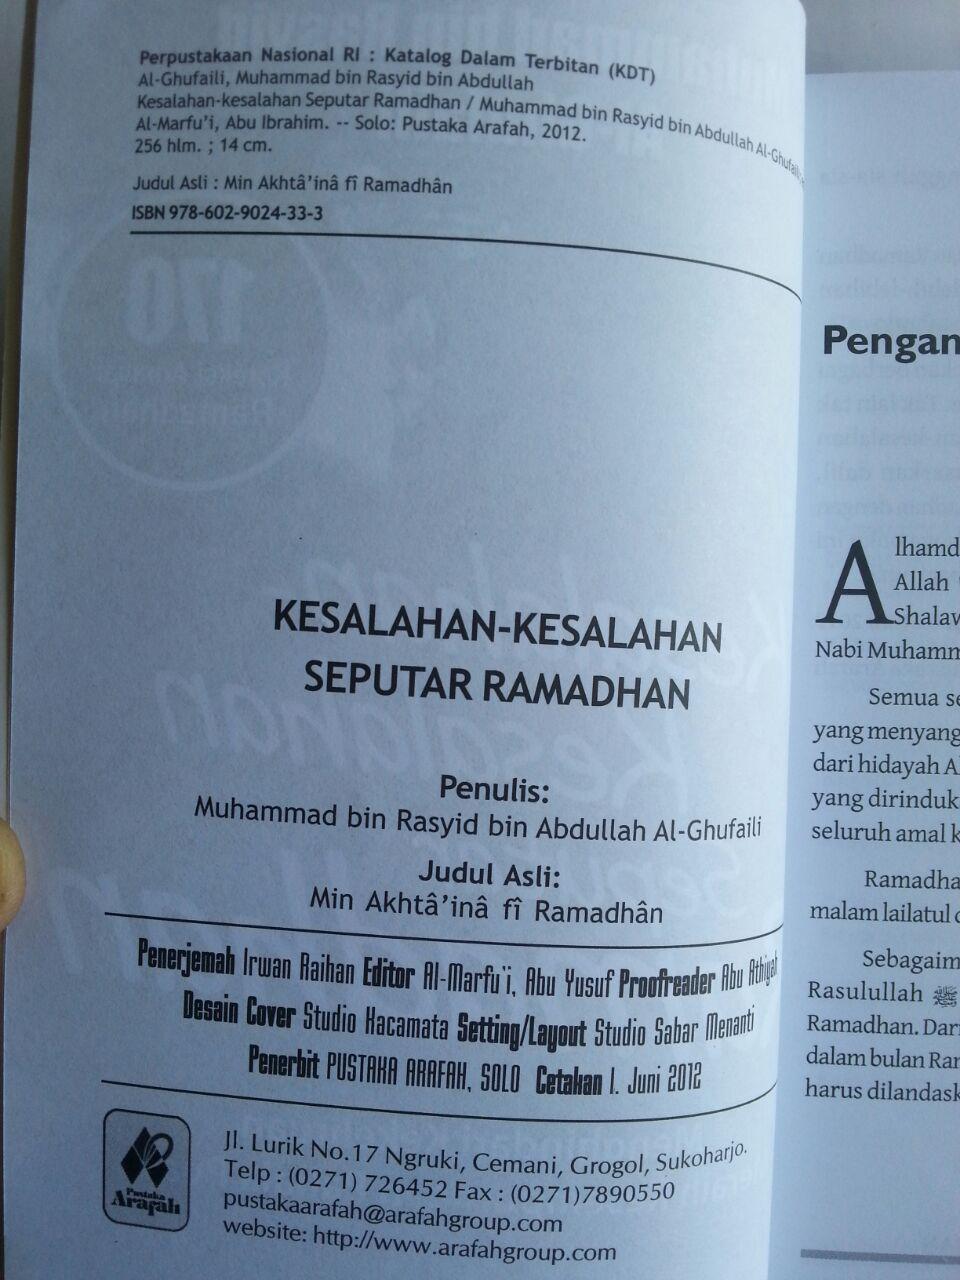 Buku Kesalahan-Kesalahan Seputar Ramadhan 170 Koreksi isi